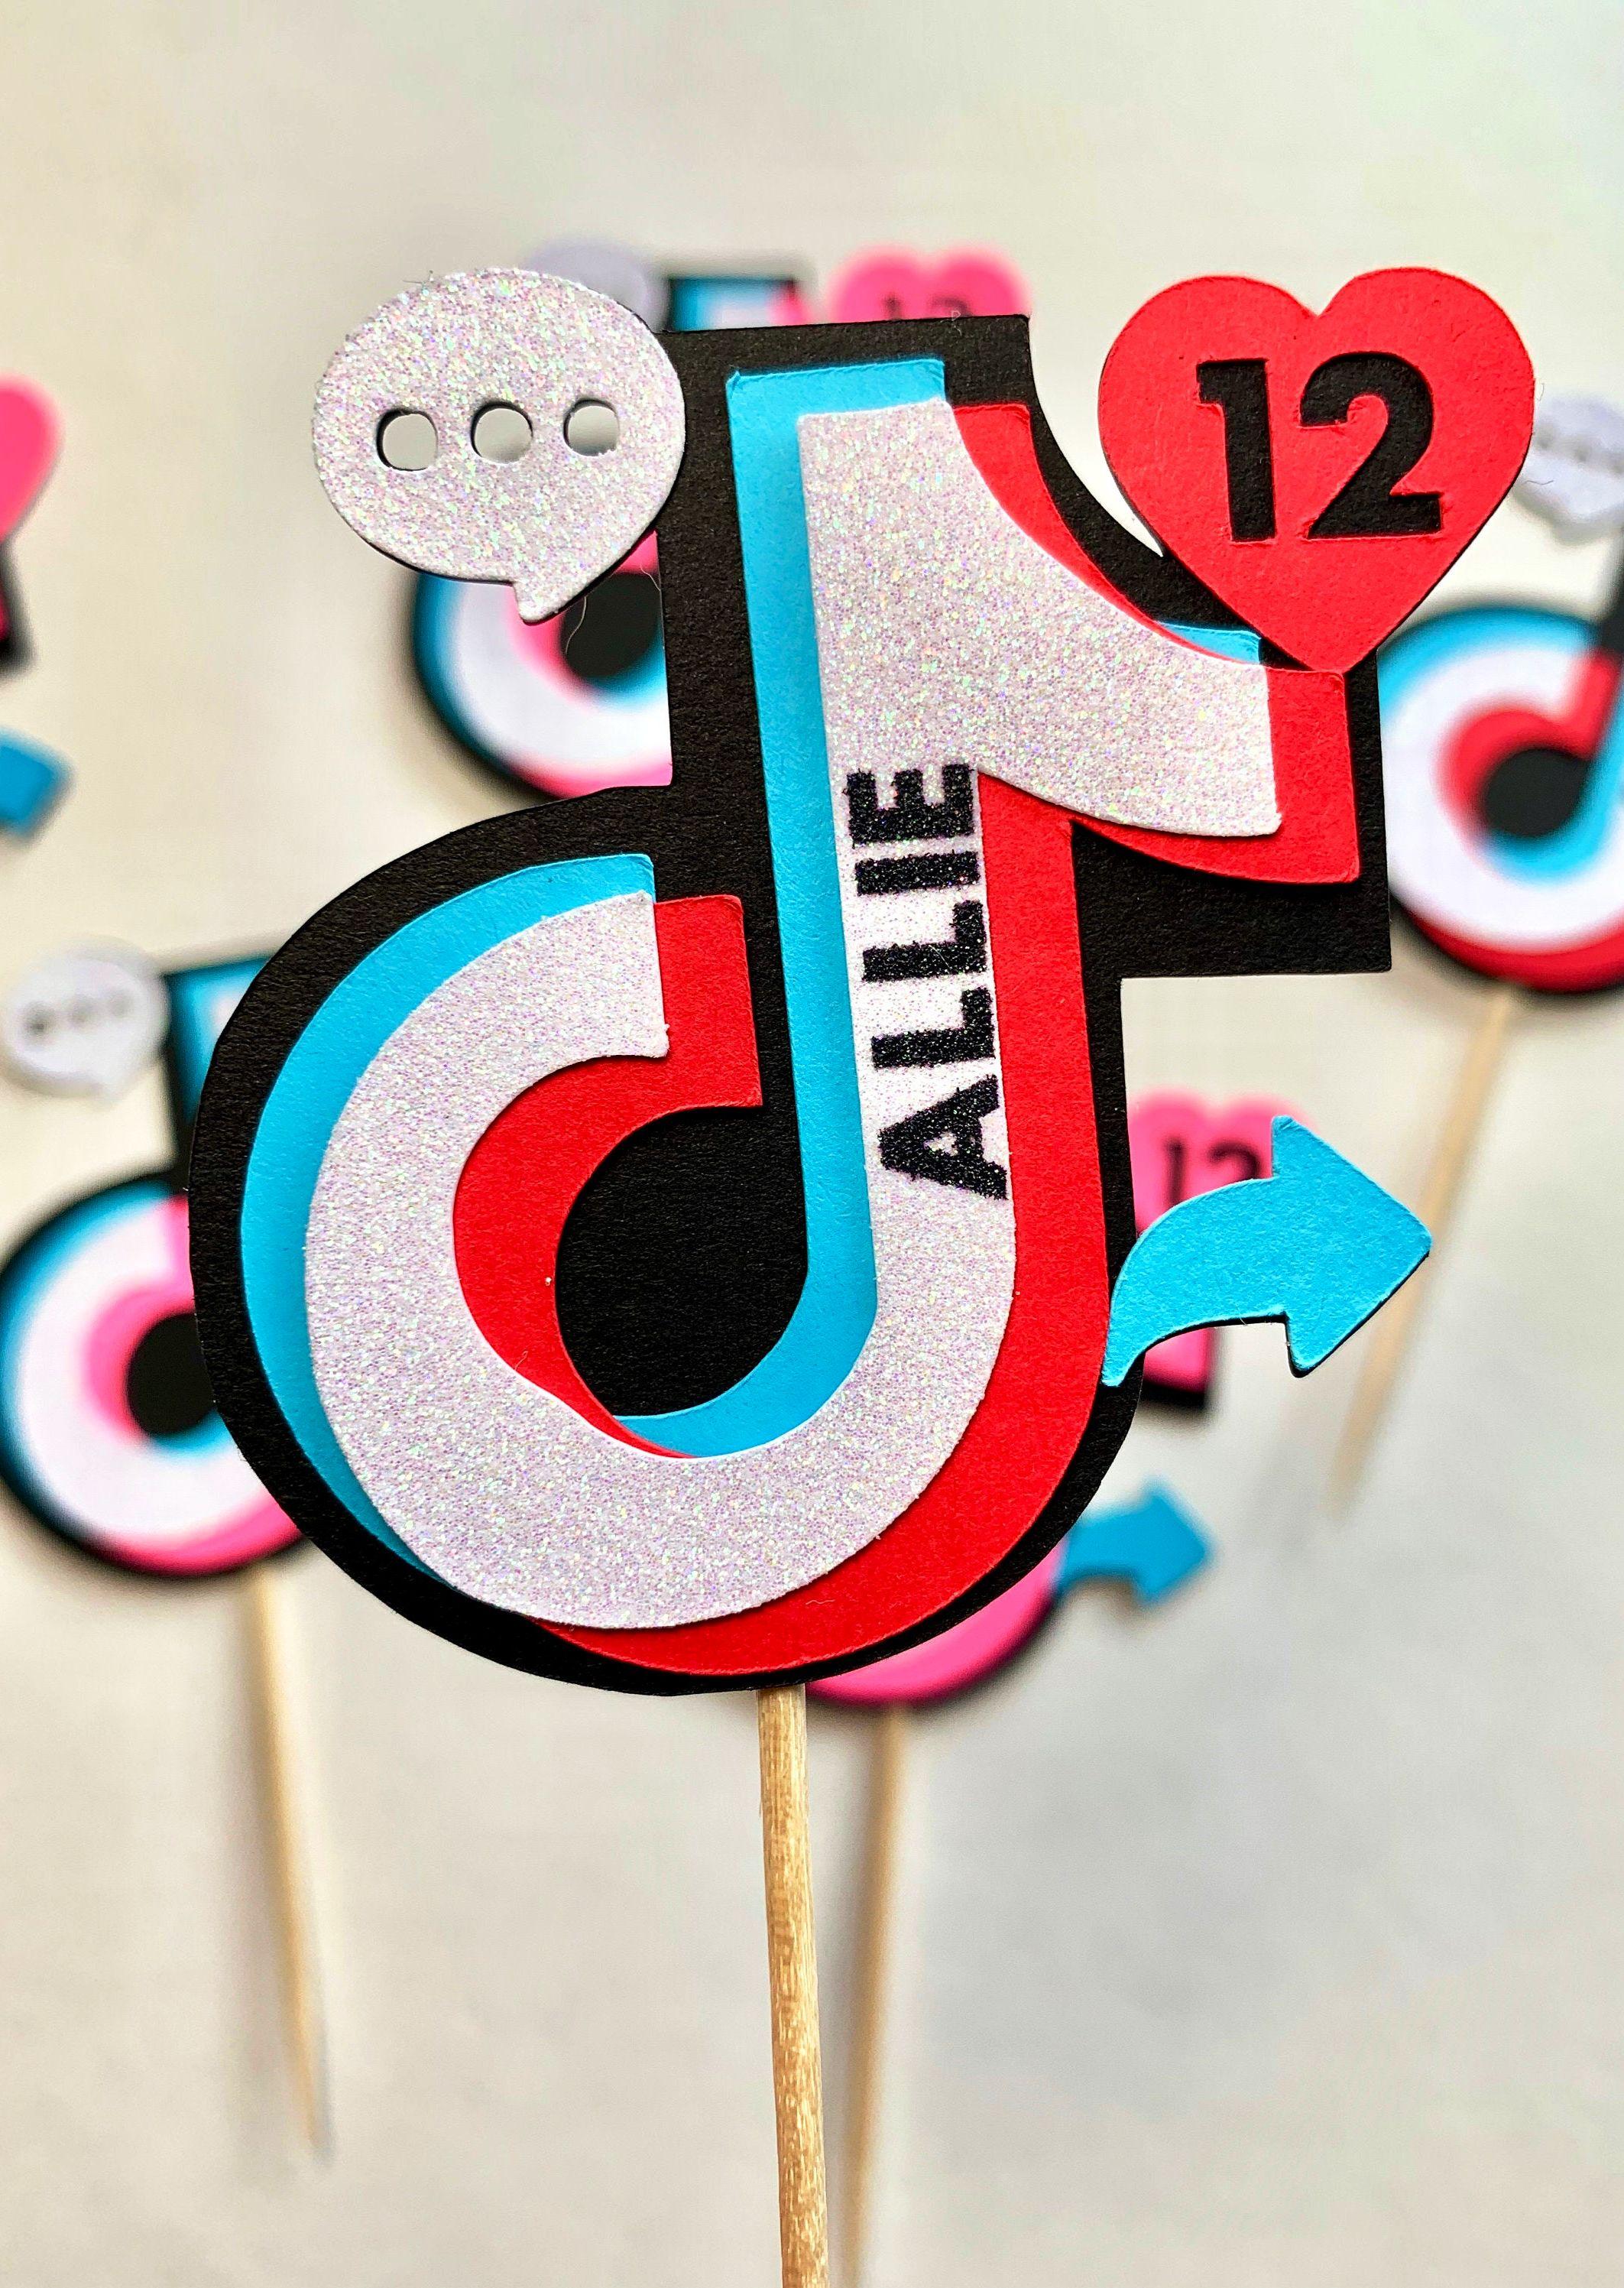 Tik Tok Tiktok Personalized Icons Cupcake Toppers Tik Tok Etsy Party Topper Halloween Themed Birthday Party Cupcake Toppers